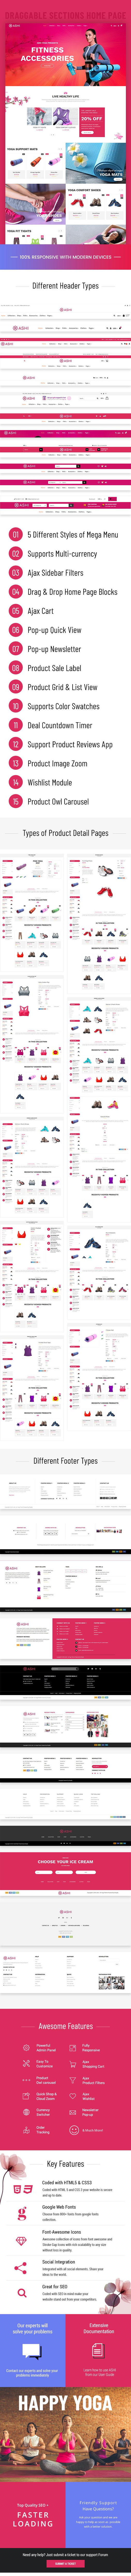 Ashi | Yoga, Fitness Shopify Theme - 1